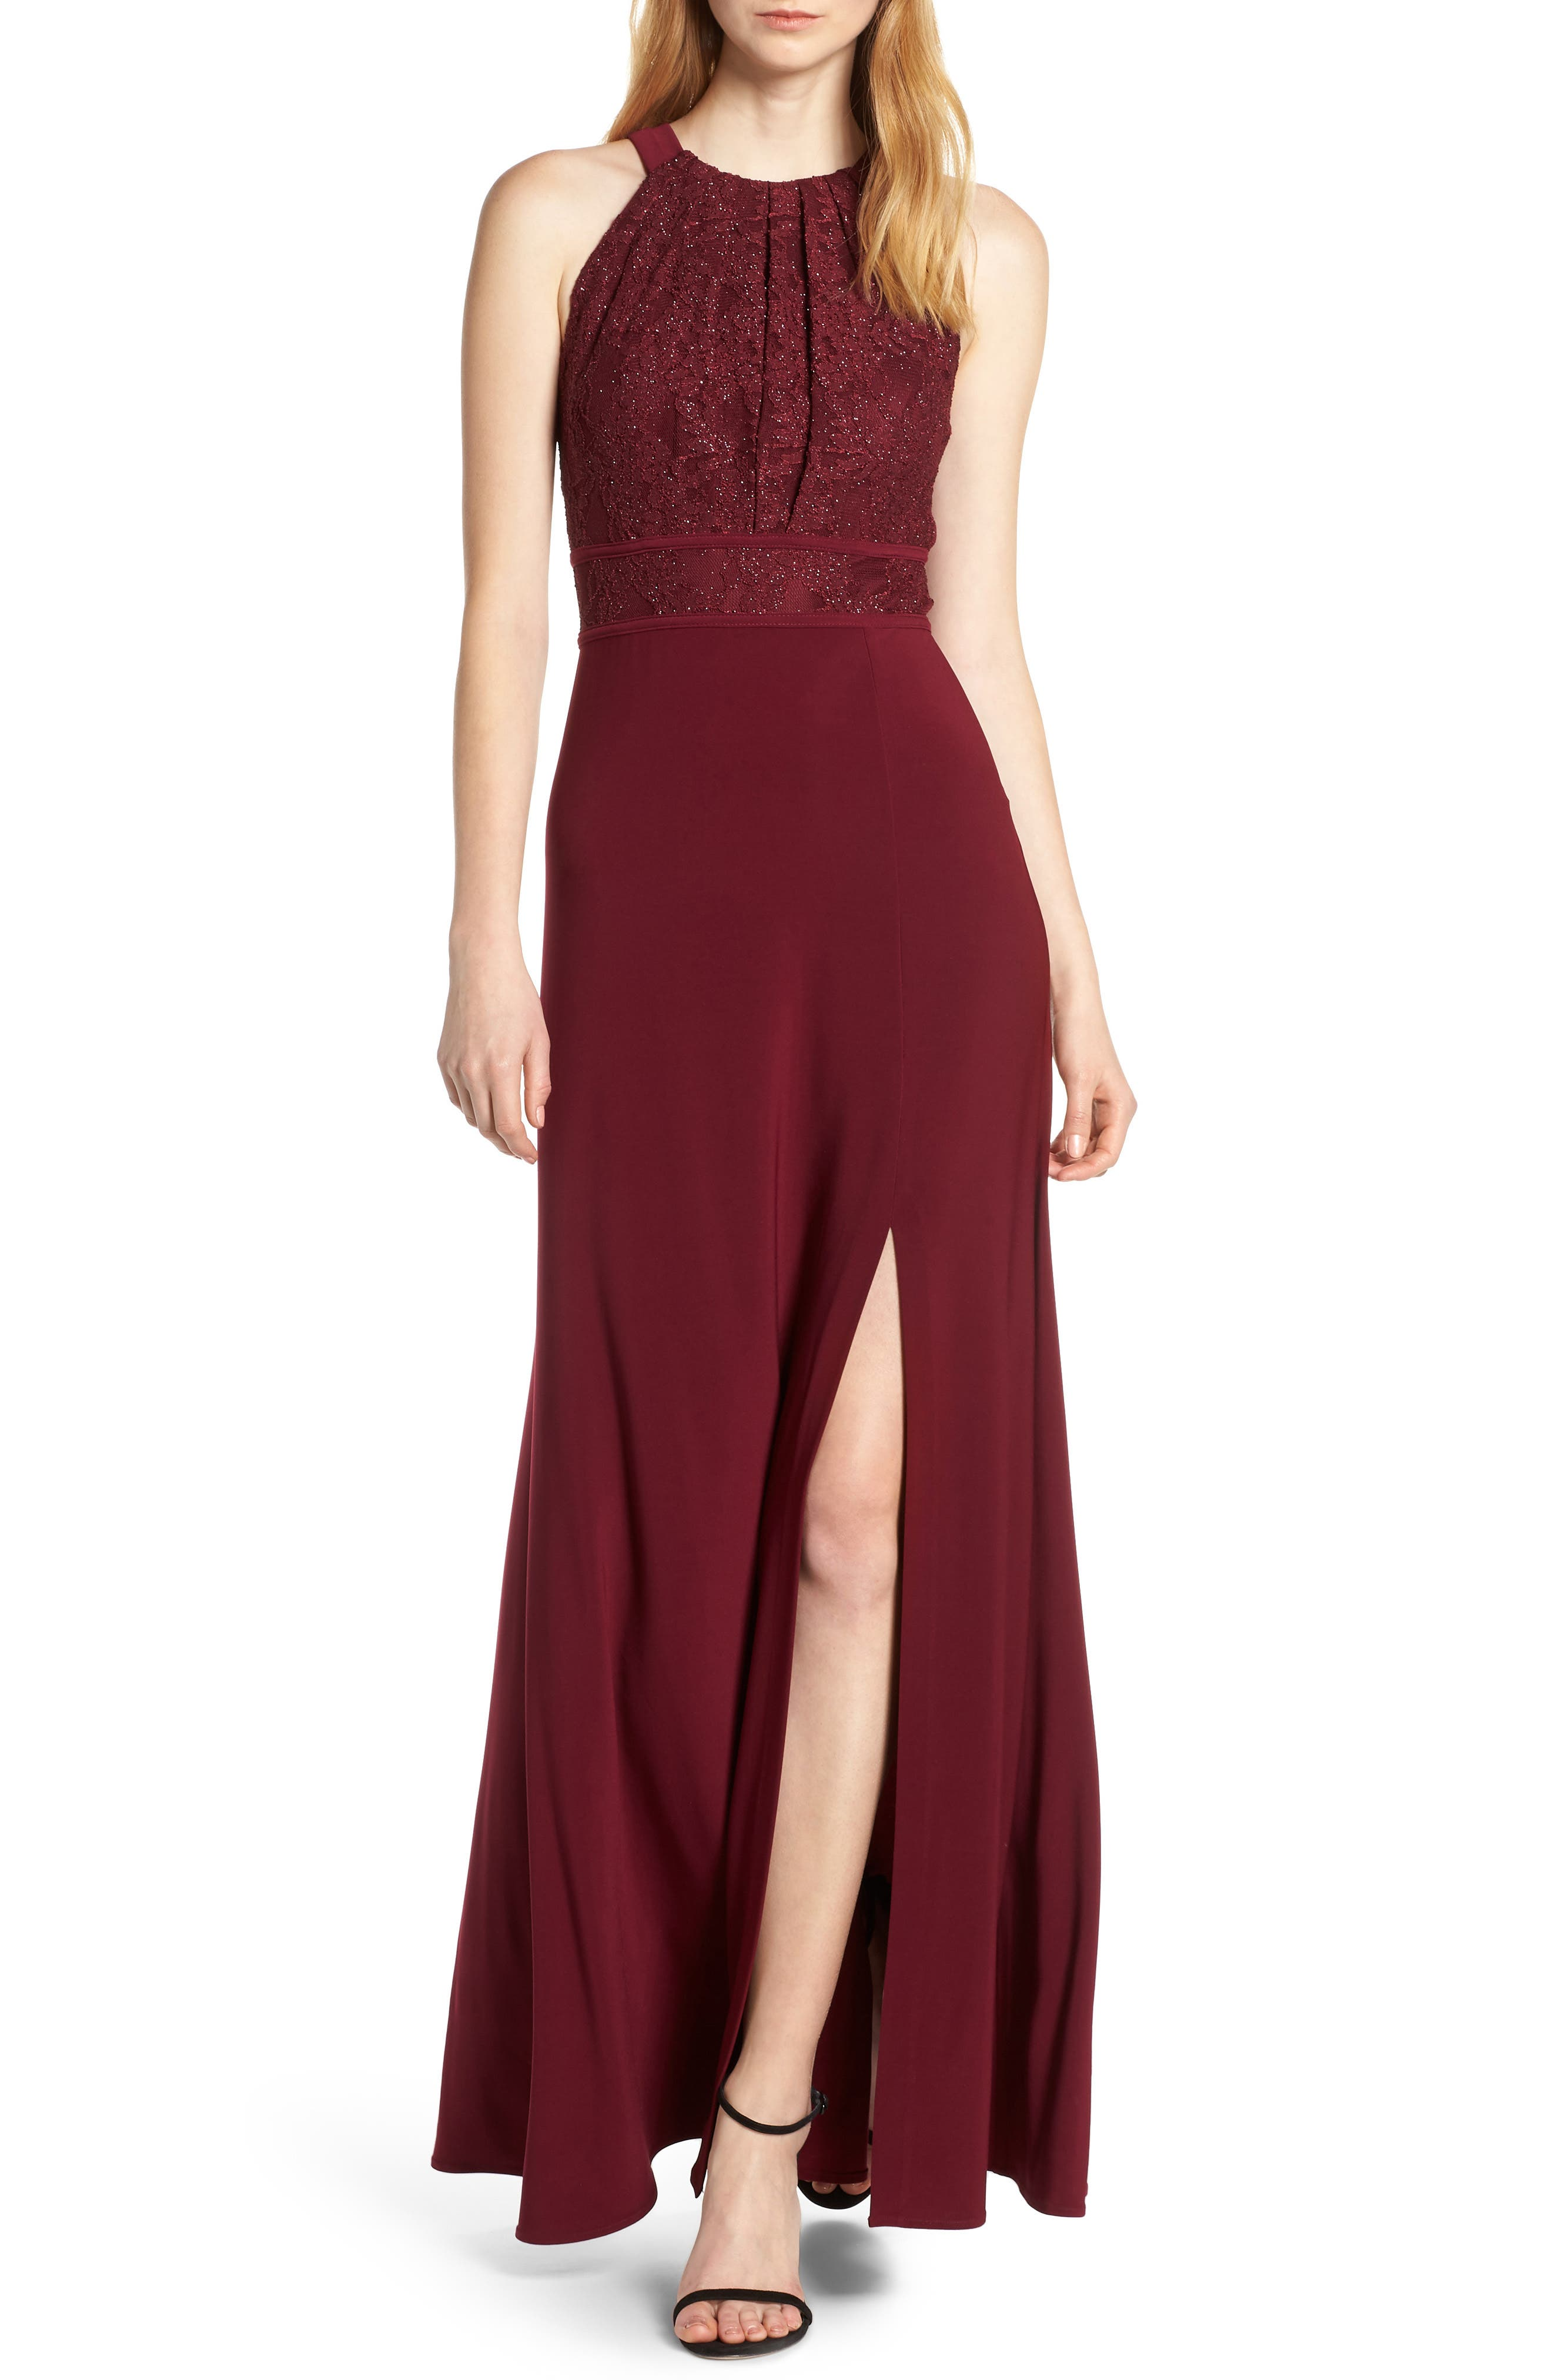 Morgan & Co. Pleat Lace Bodice Evening Dress, 5/16 - Burgundy